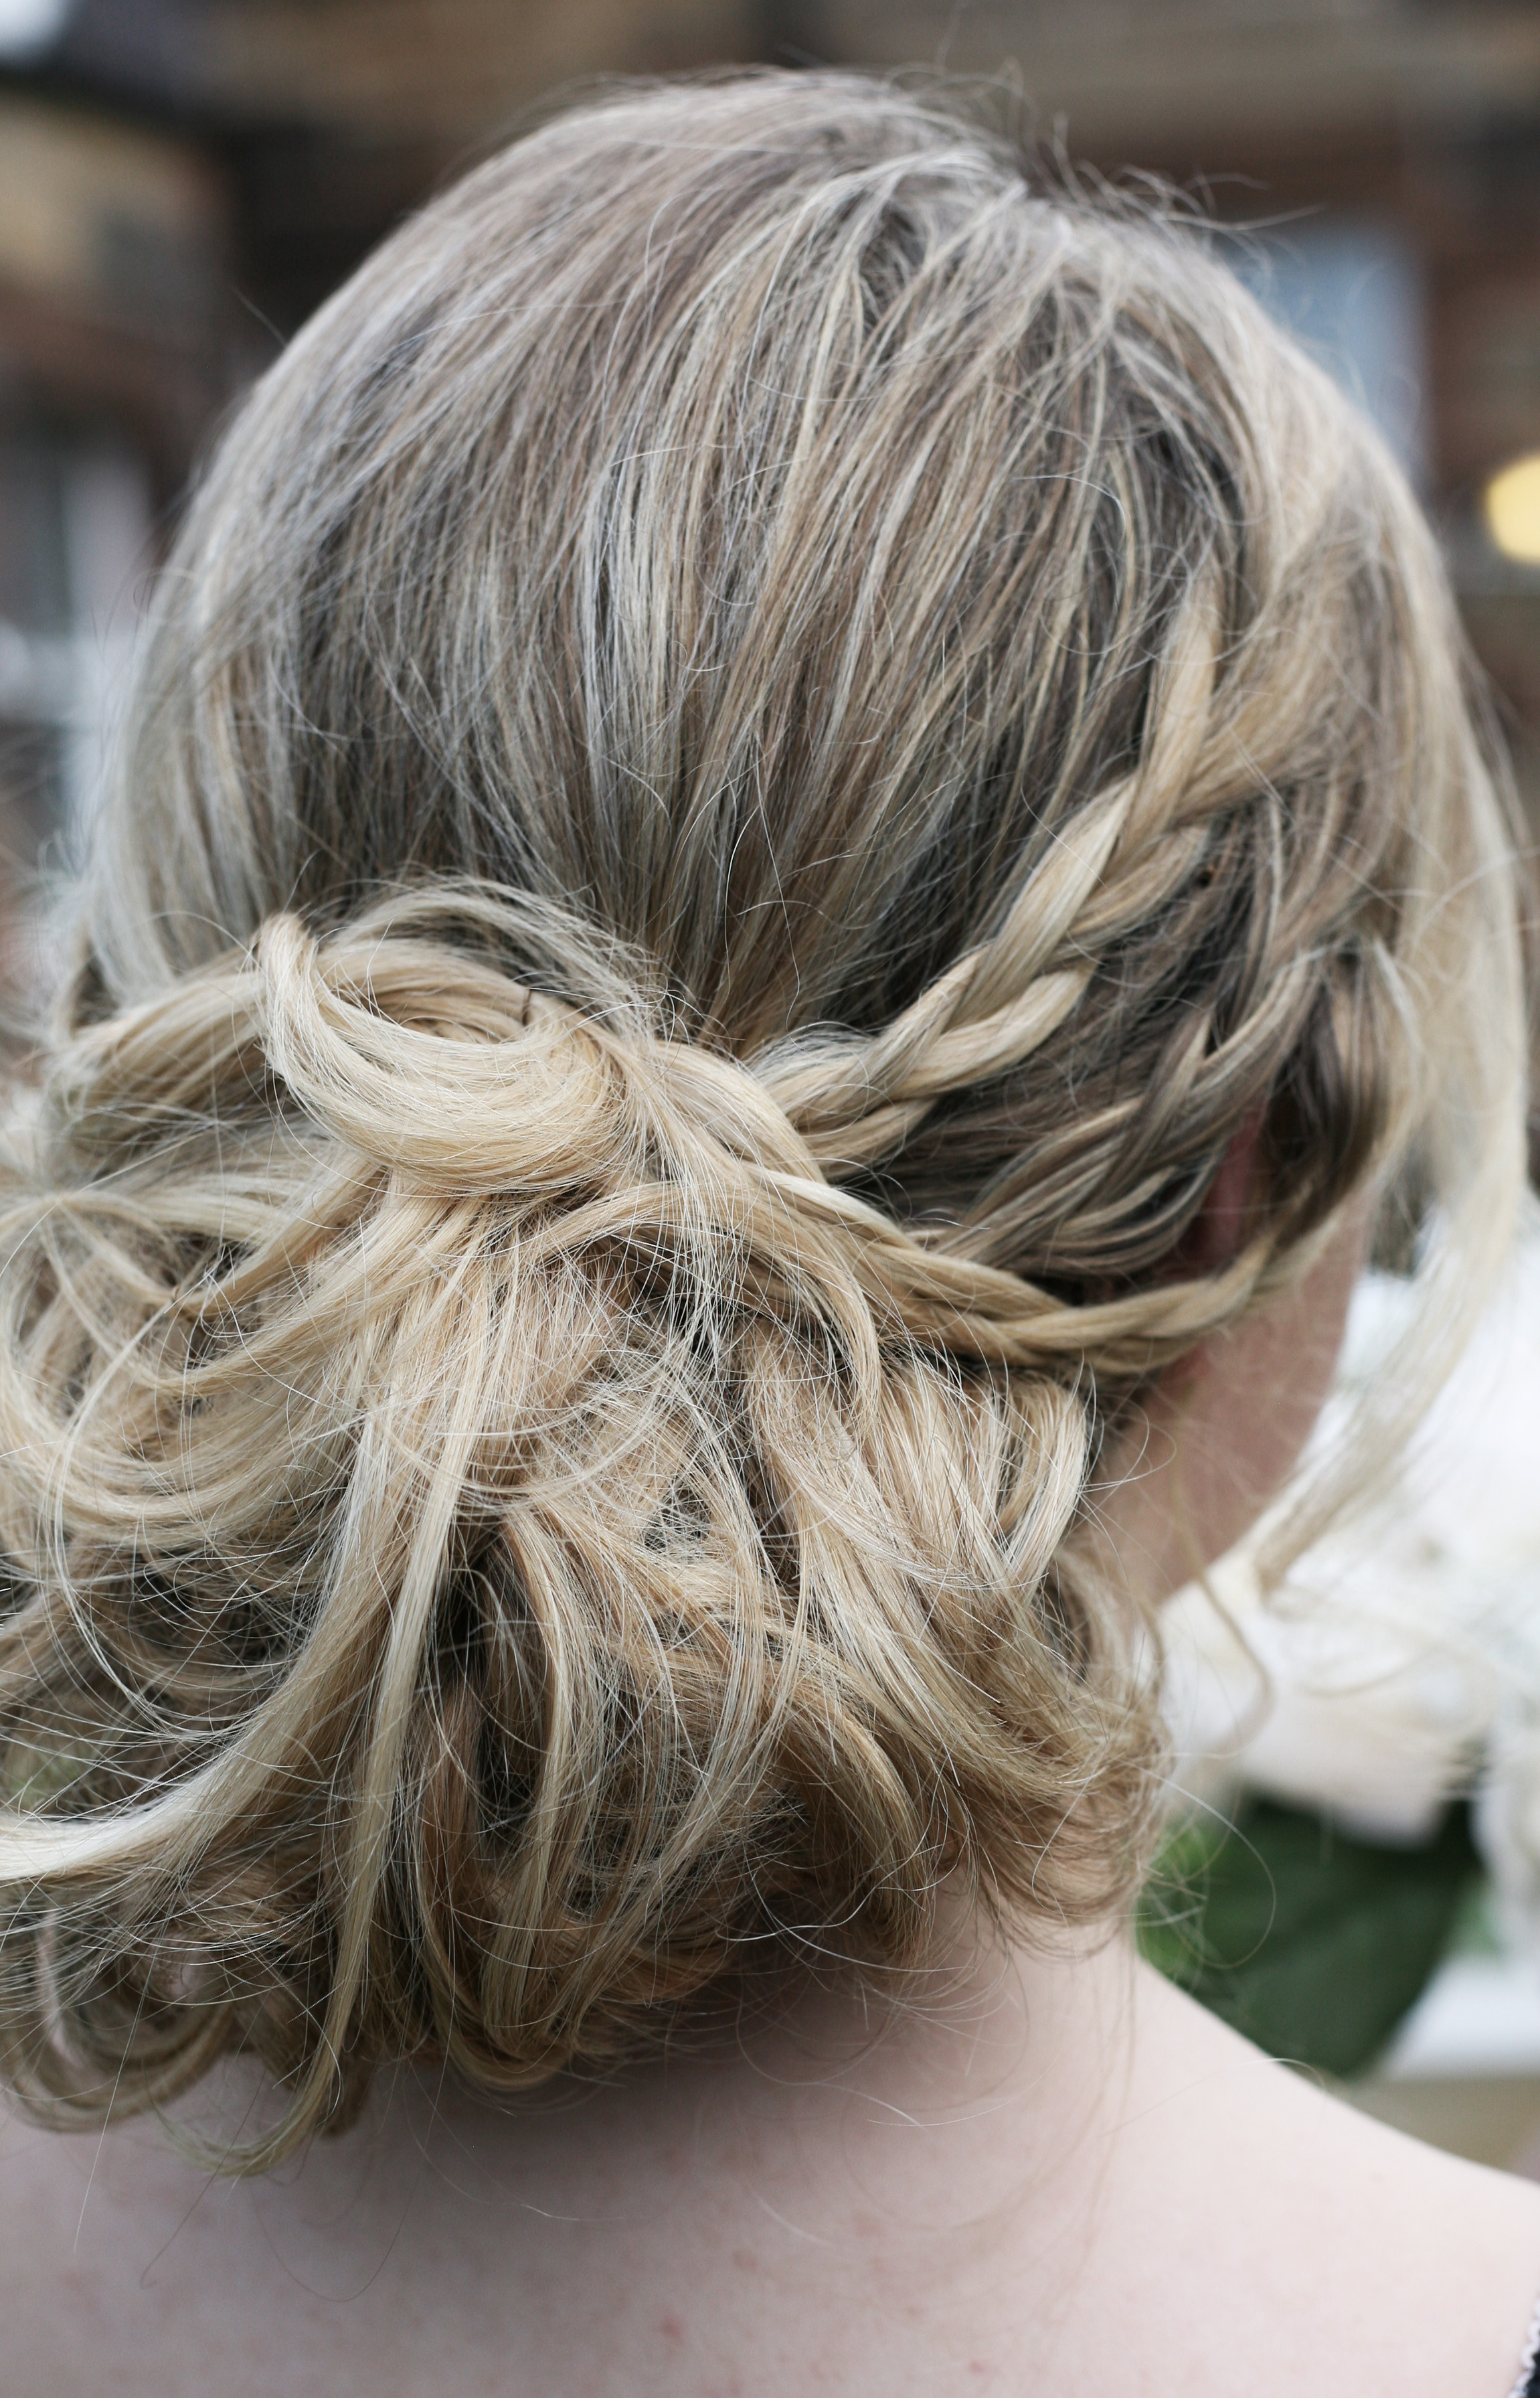 braided bridal hairstyle edinburgh